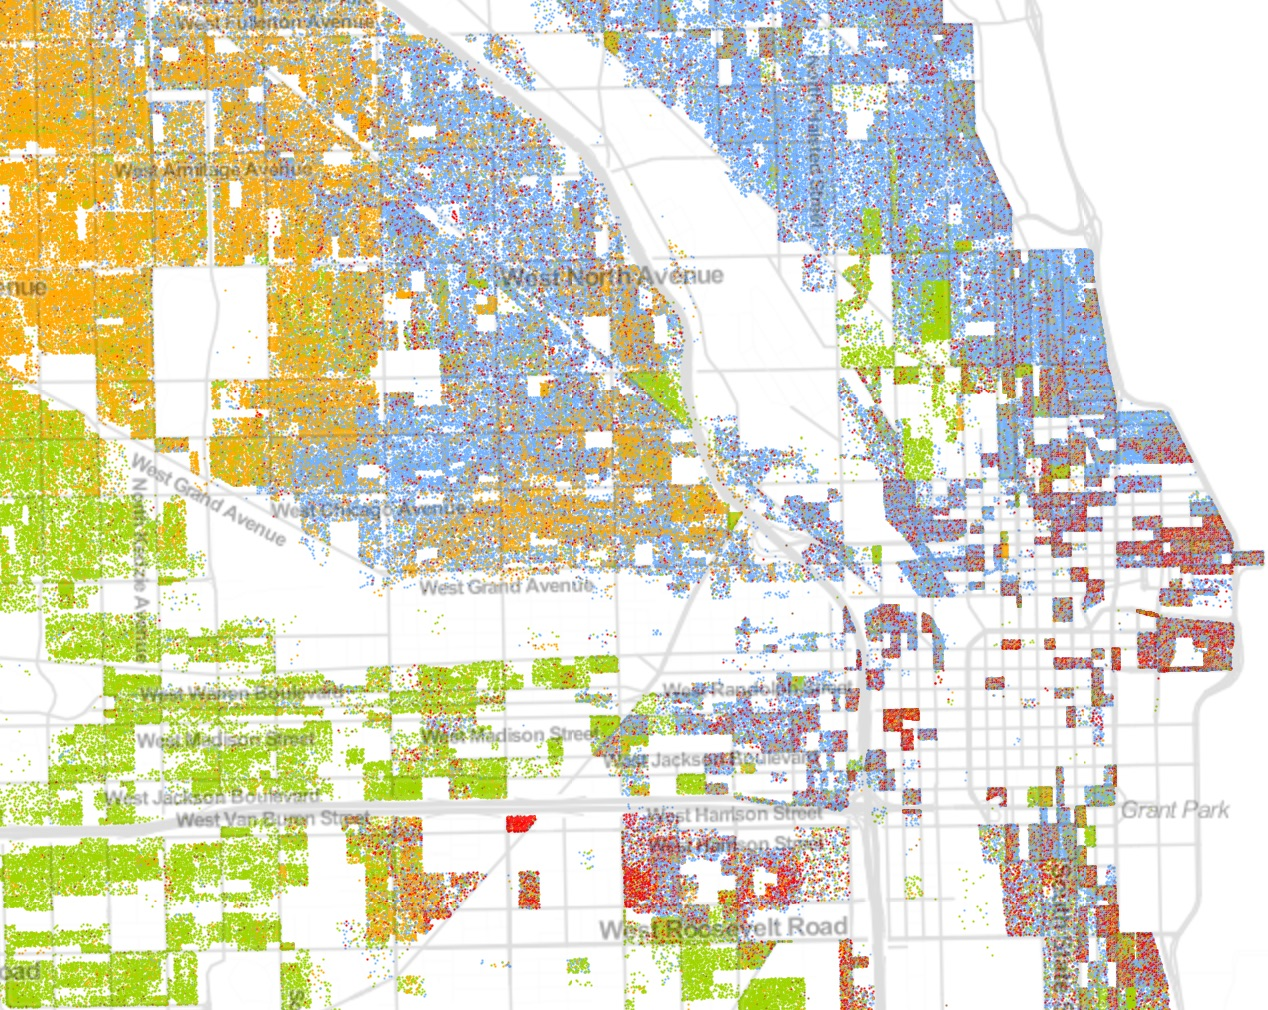 Chicago demographic data